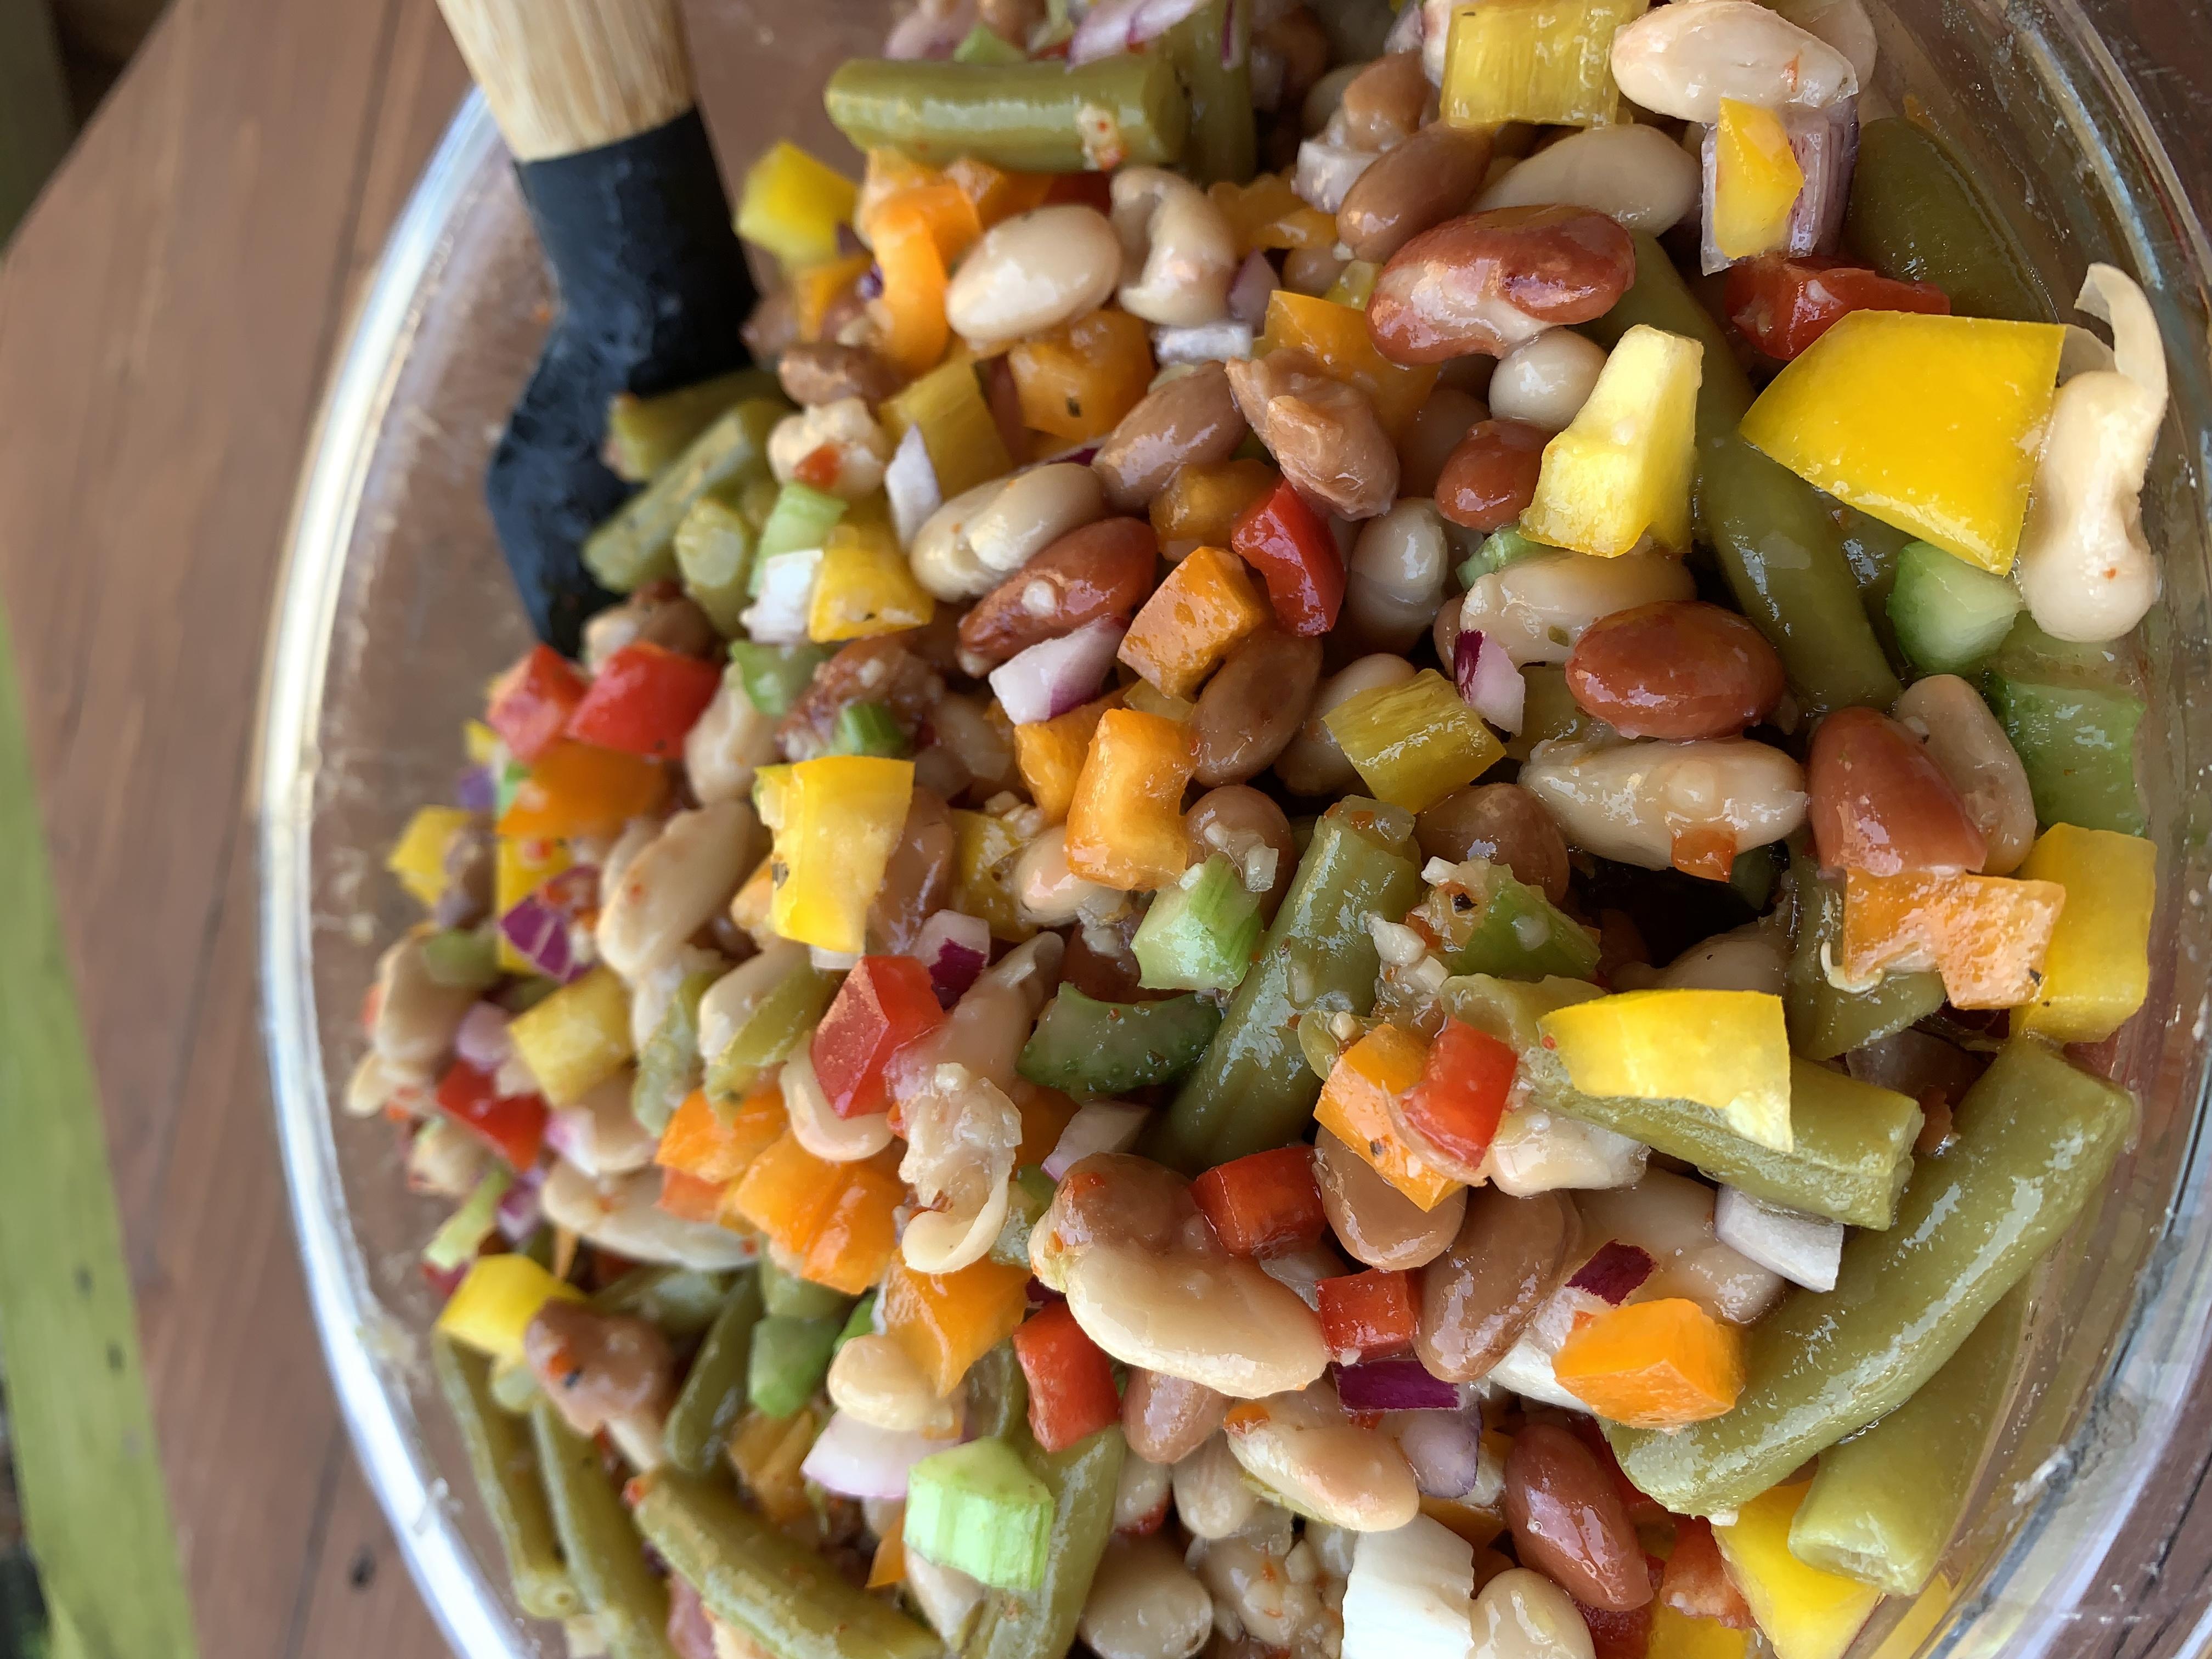 Bowl of bean salad